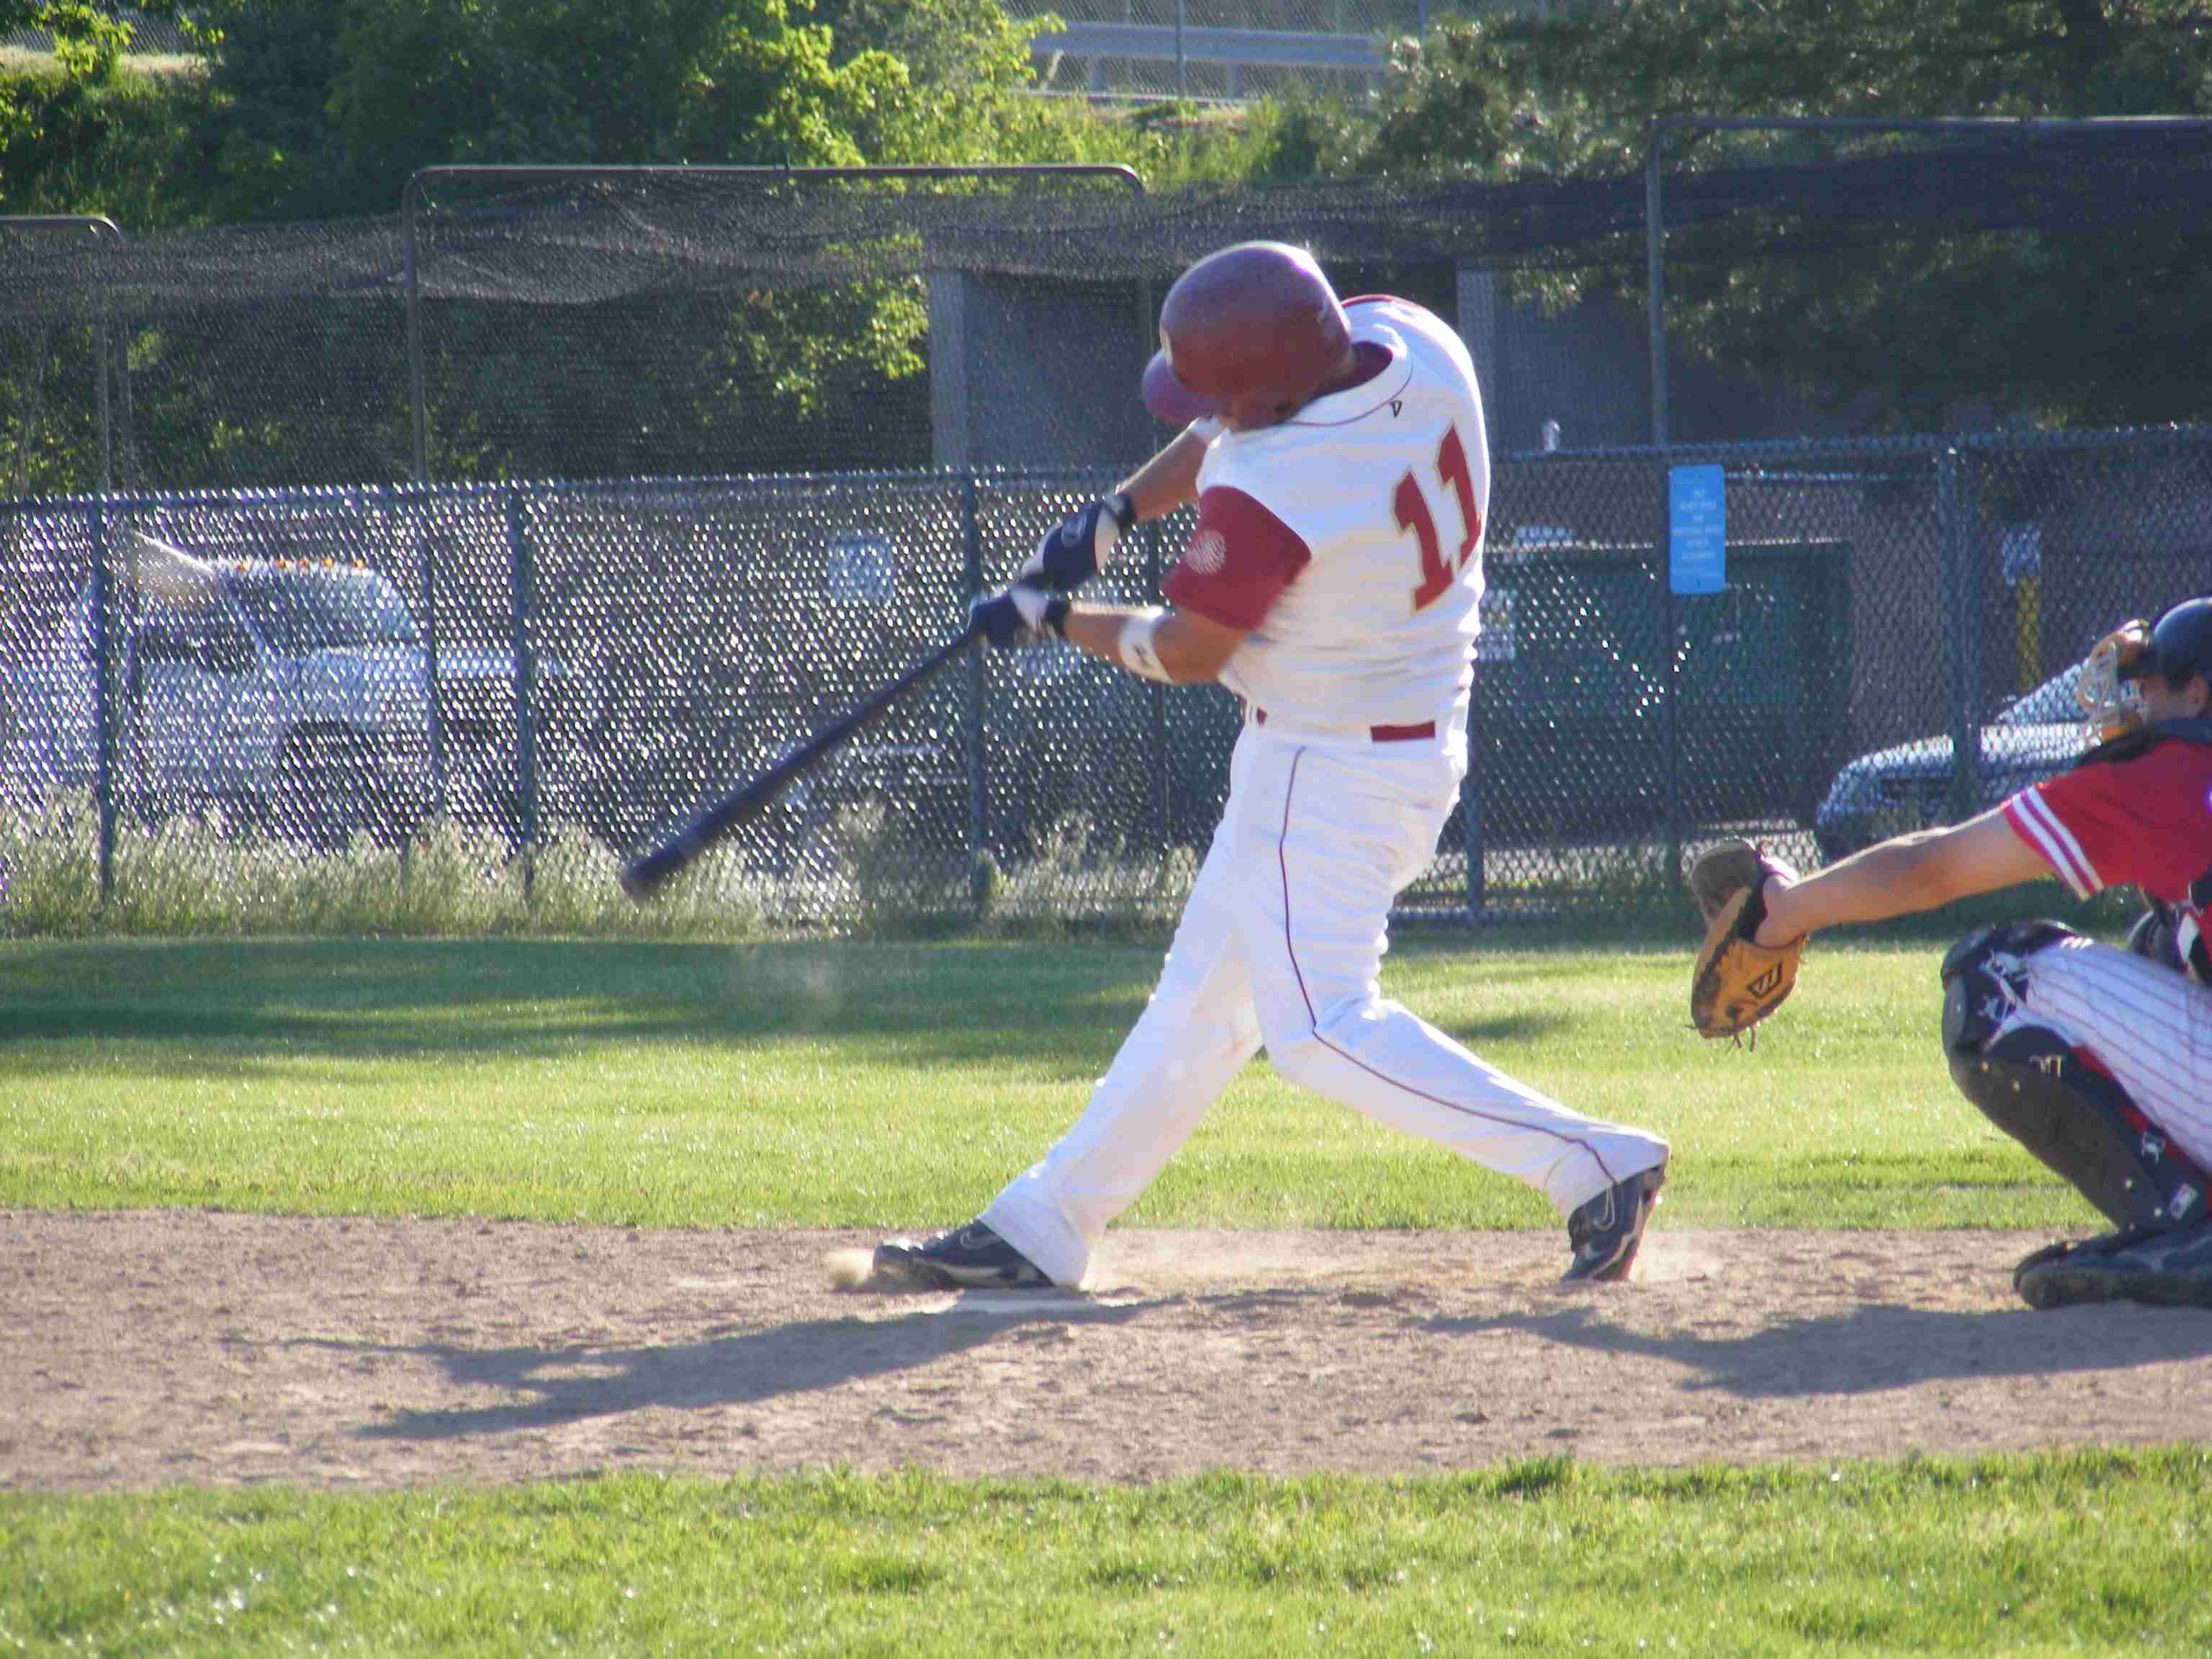 Andre Swinging